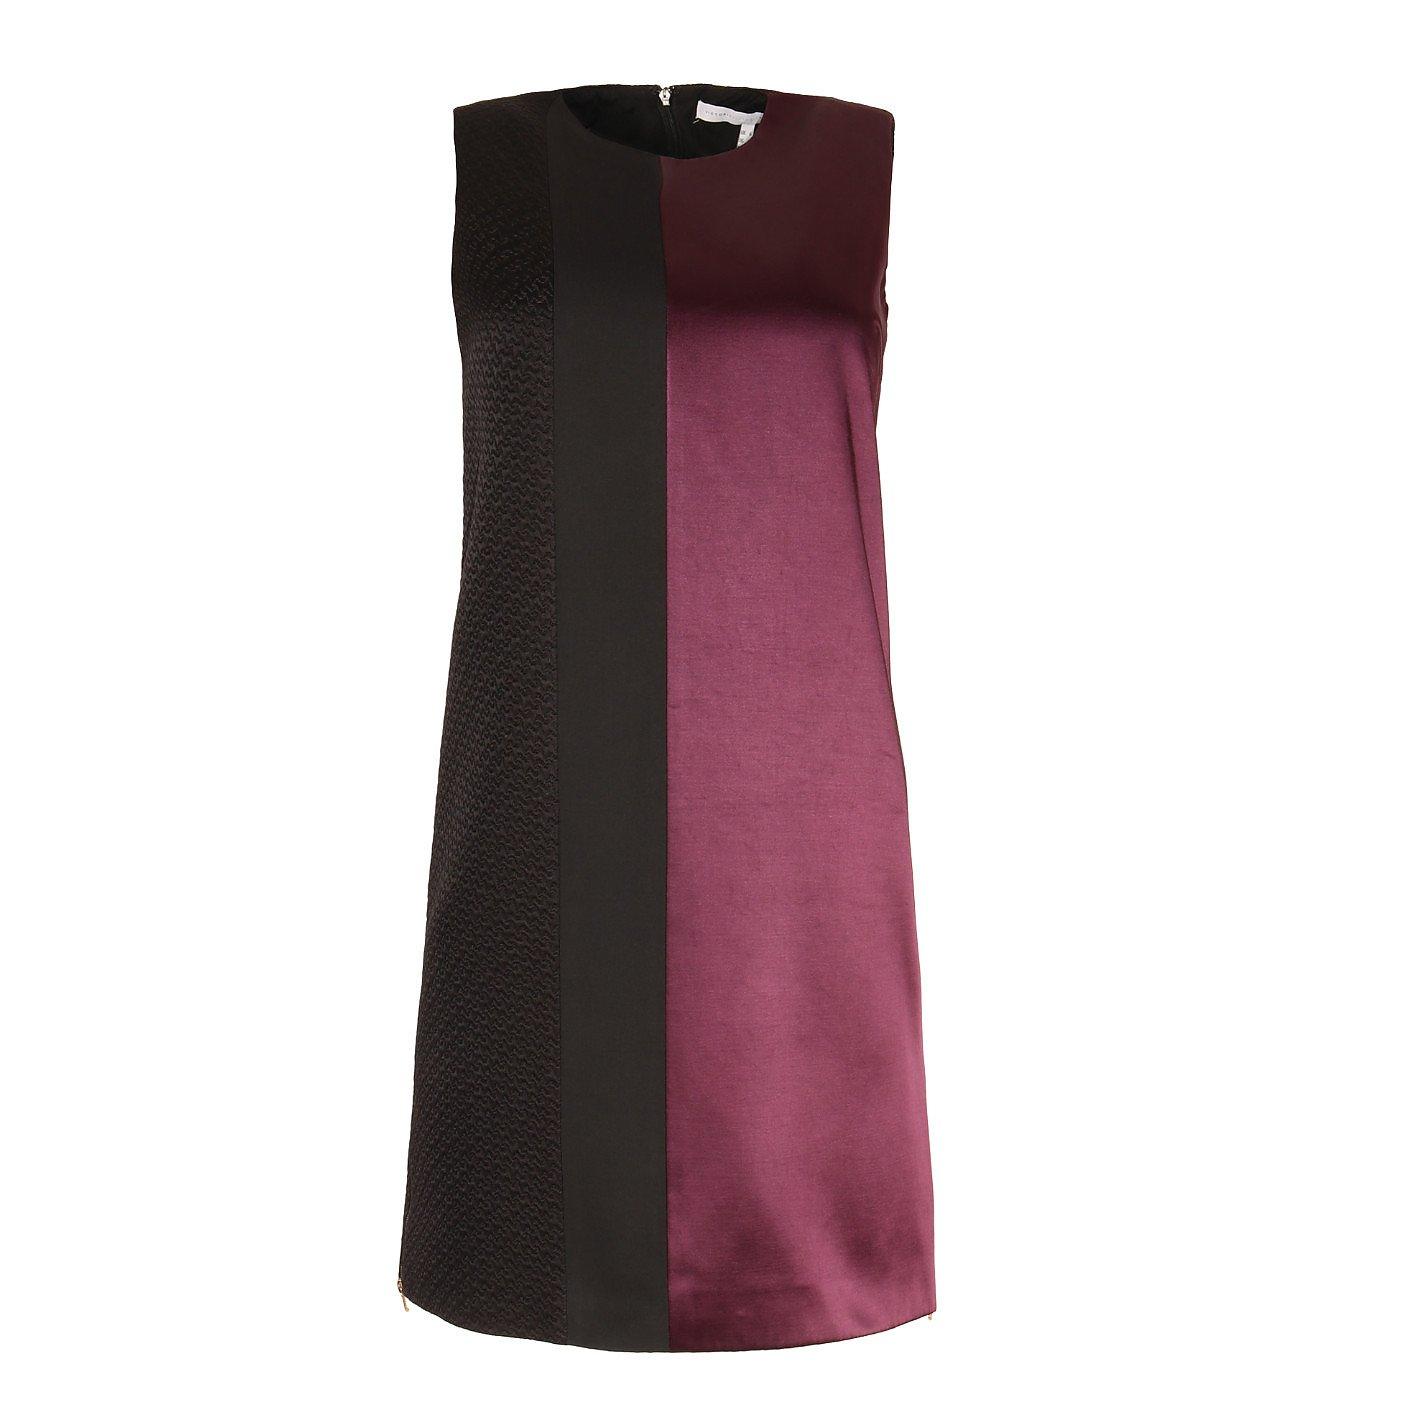 Victoria Beckham Contrast Panelled Dress